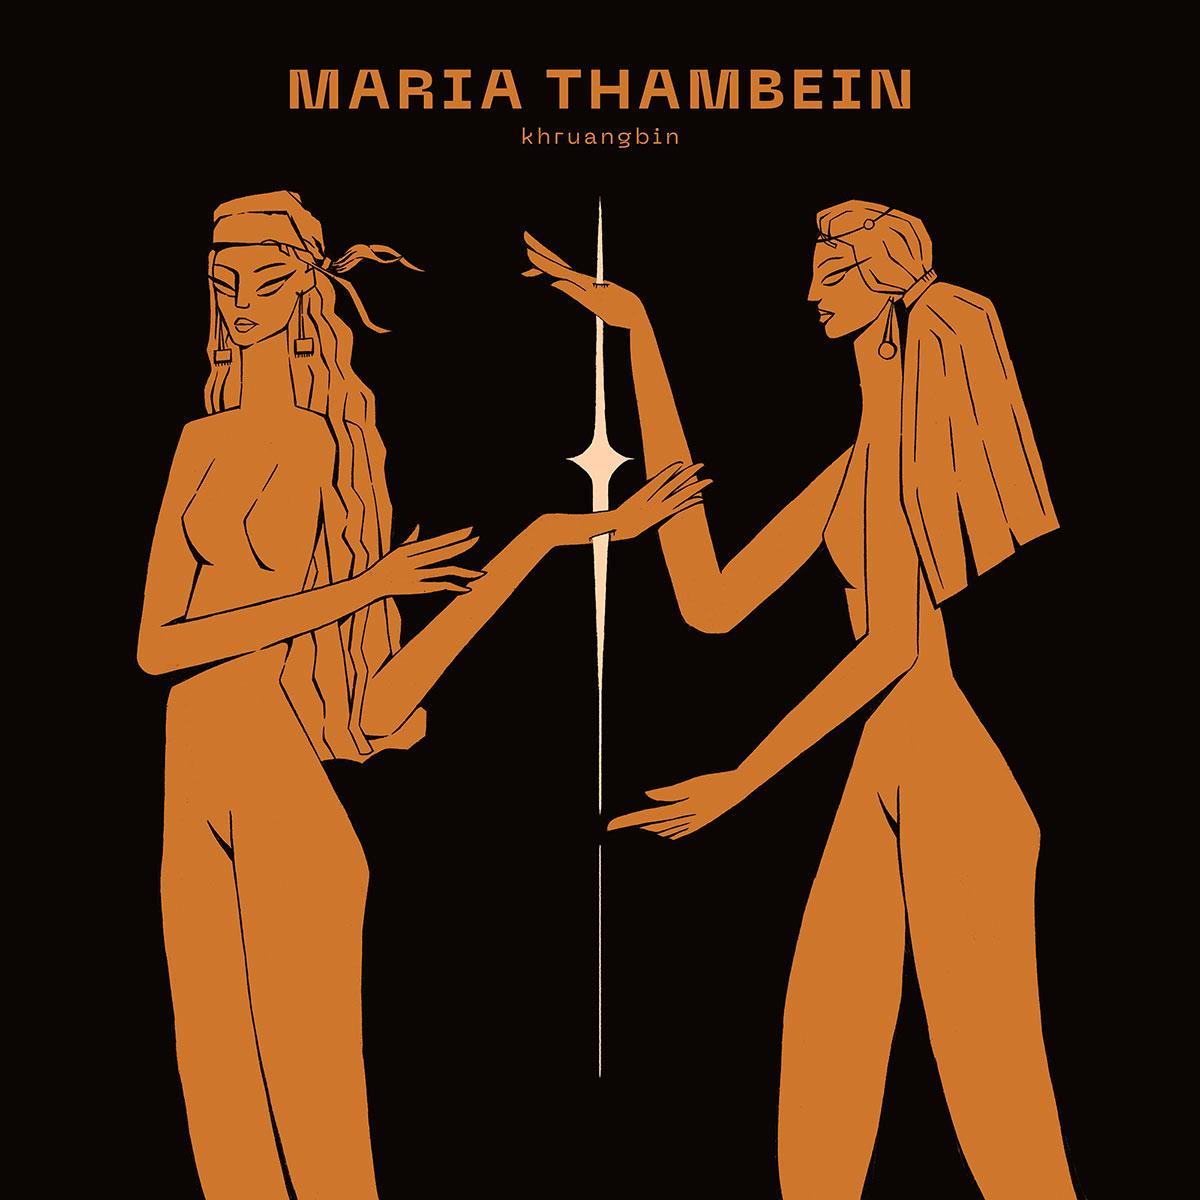 Mariathambein